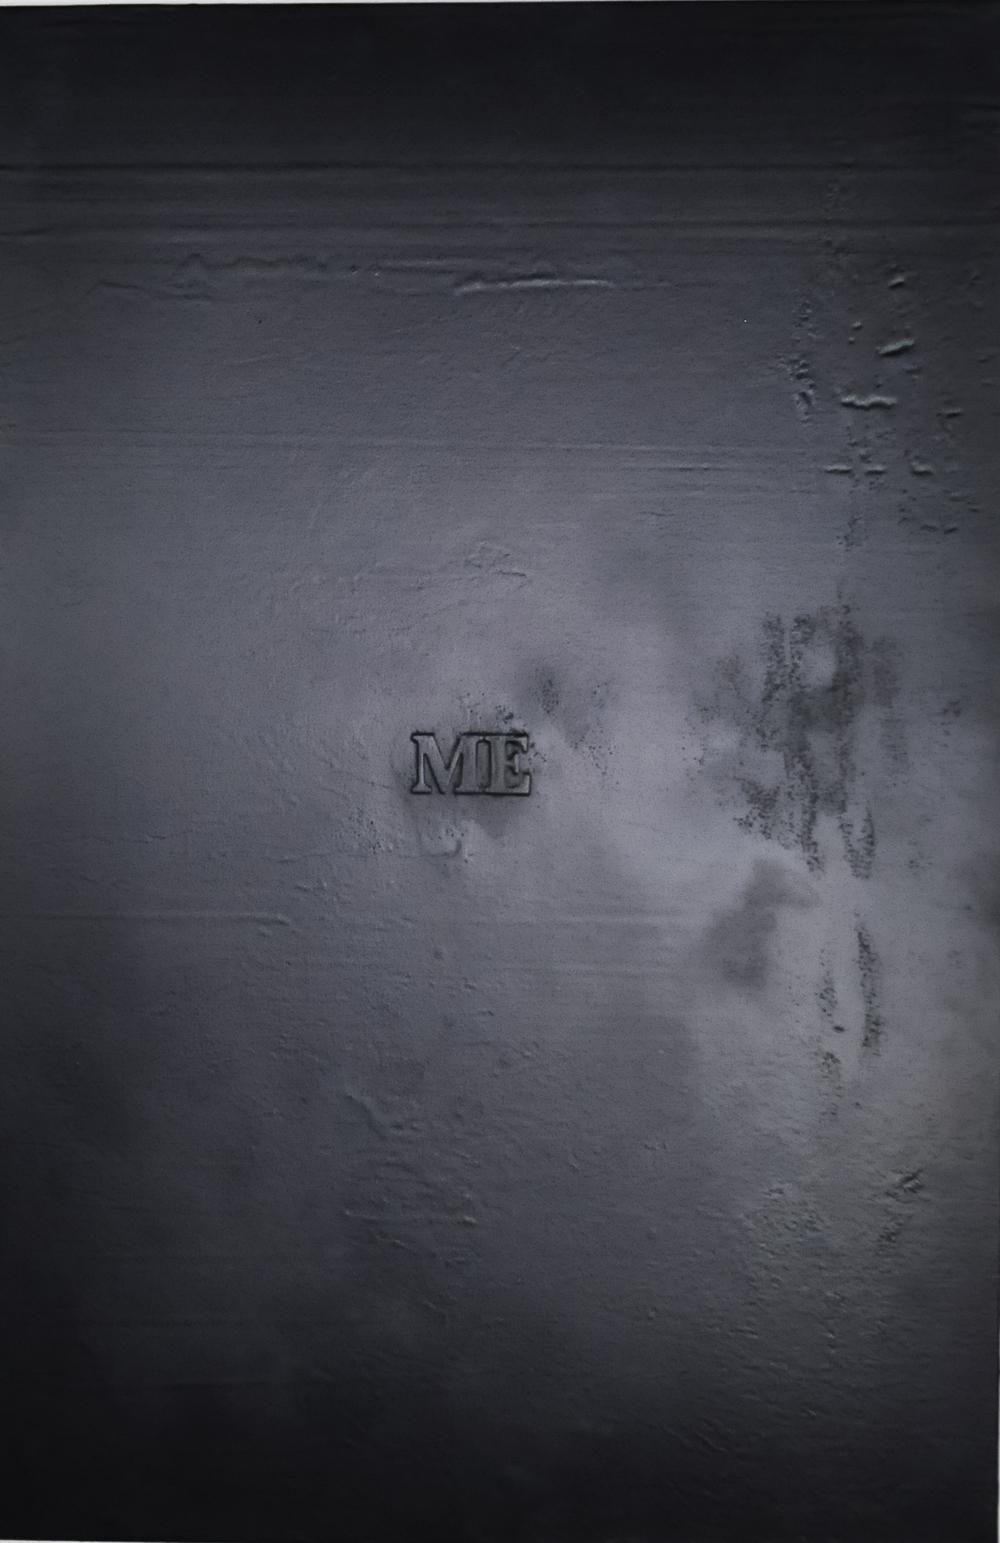 II. Me, 2016